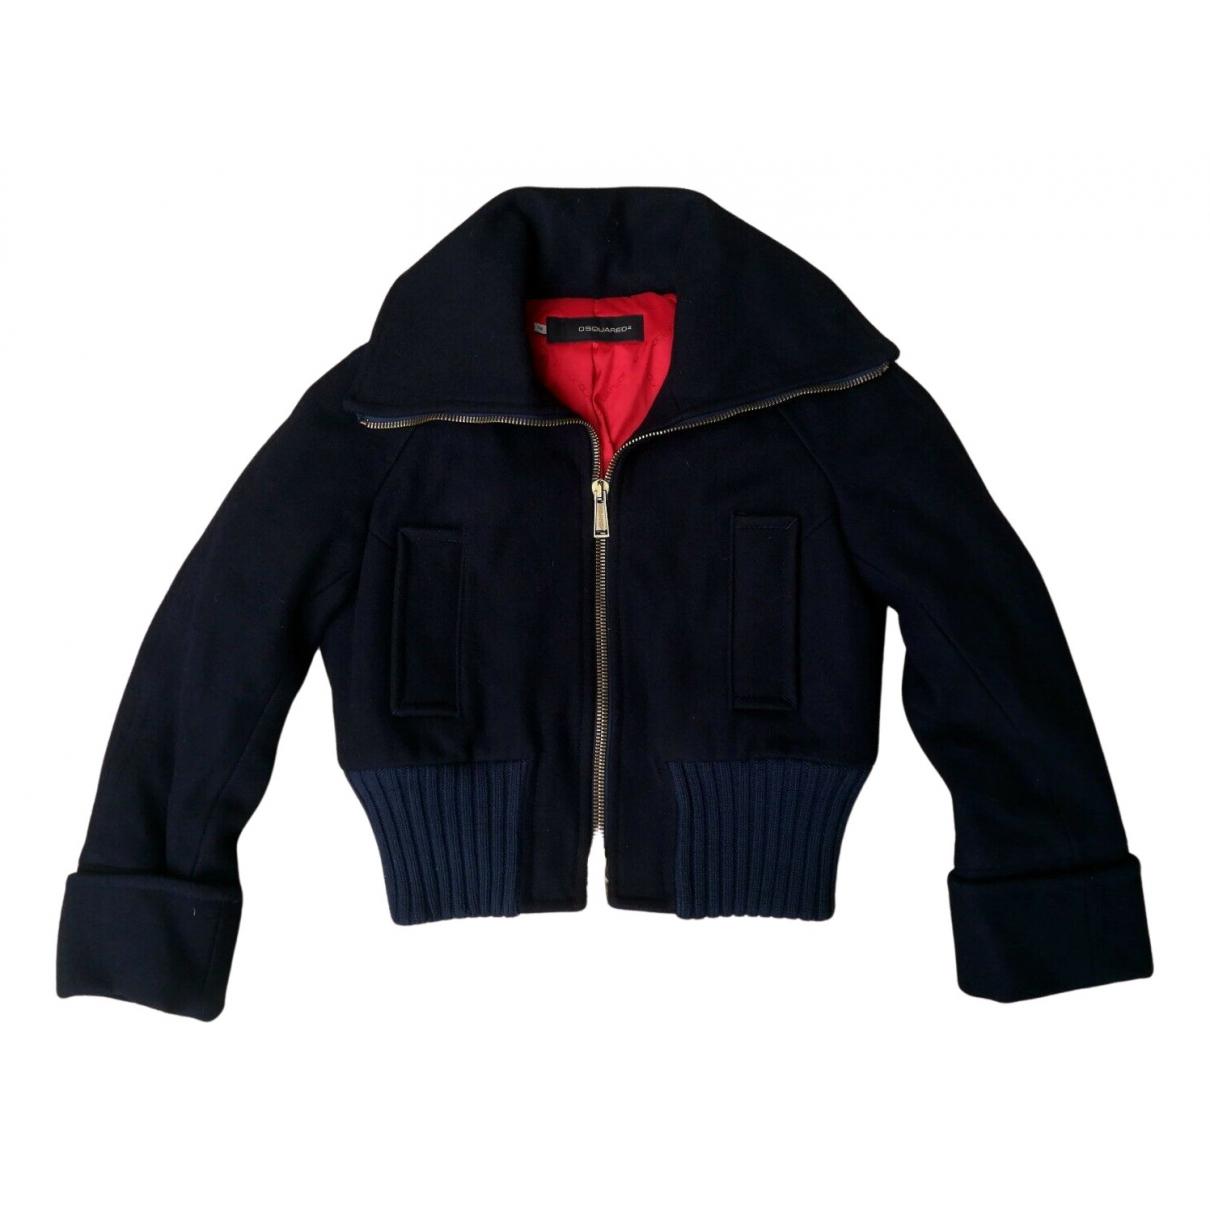 Dsquared2 \N Jacke in  Blau Wolle